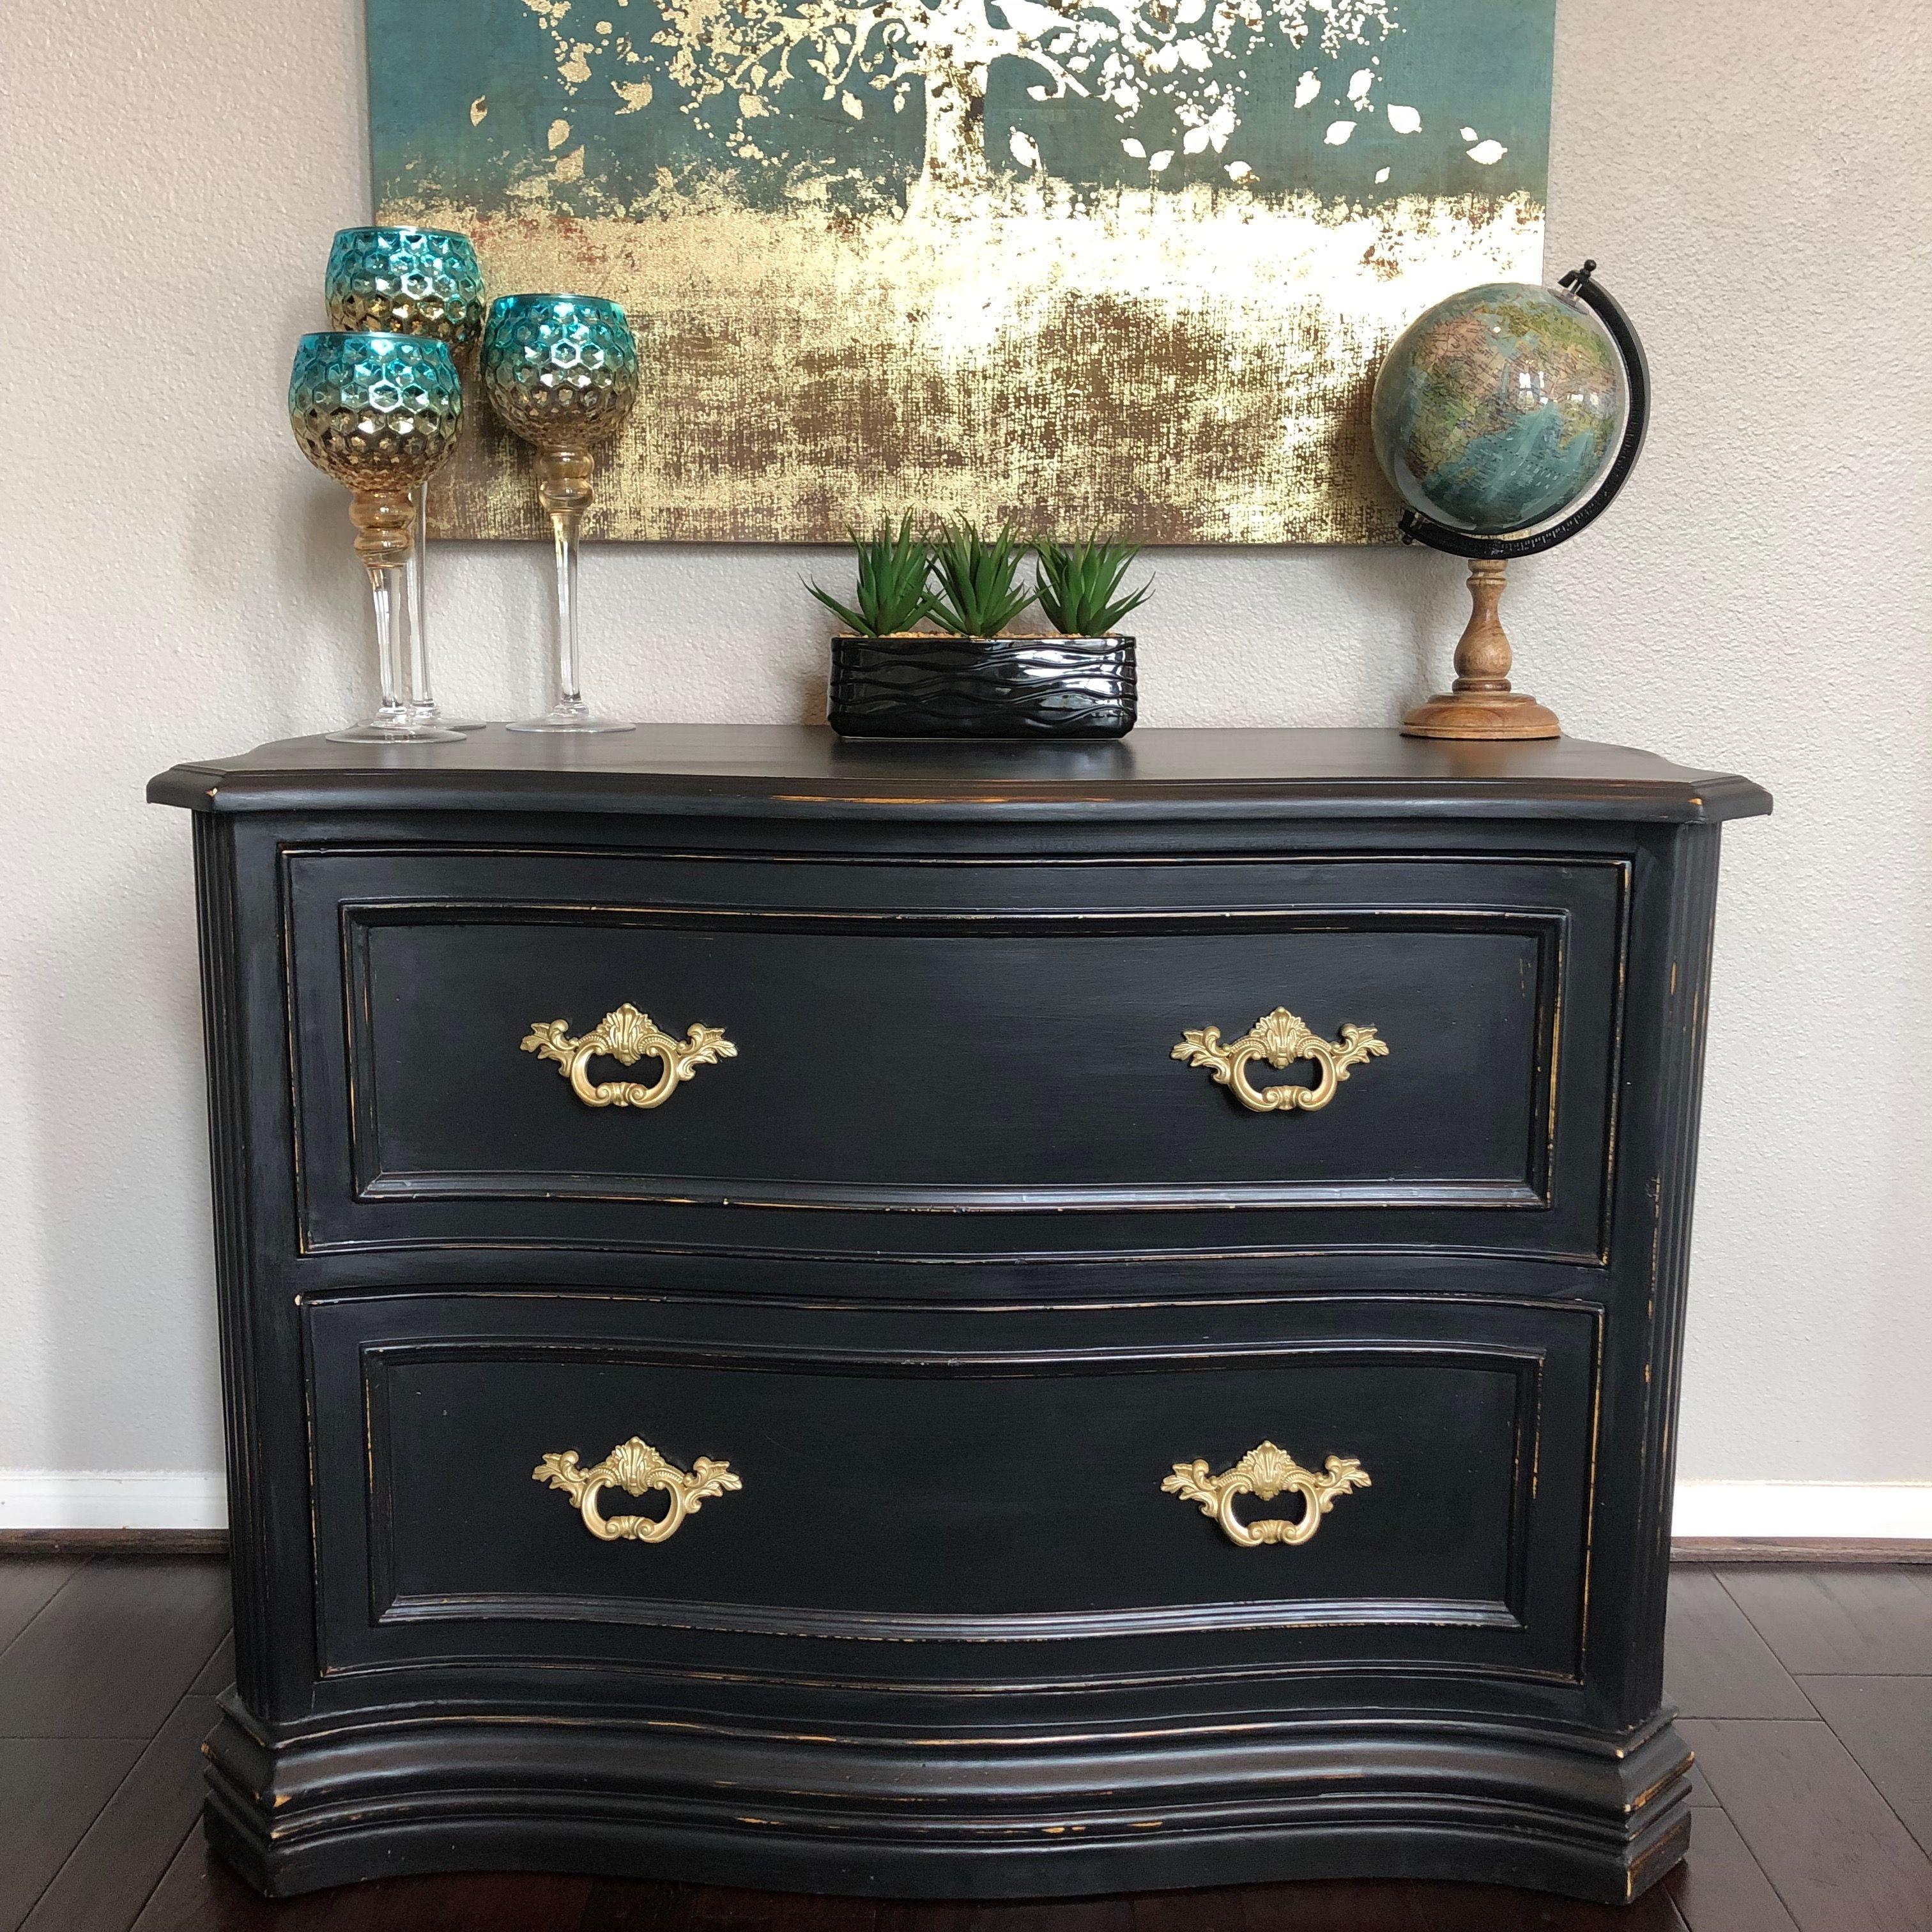 Black And Gold Handles Dresser As Nightstand Gold Handles Antique Dresser